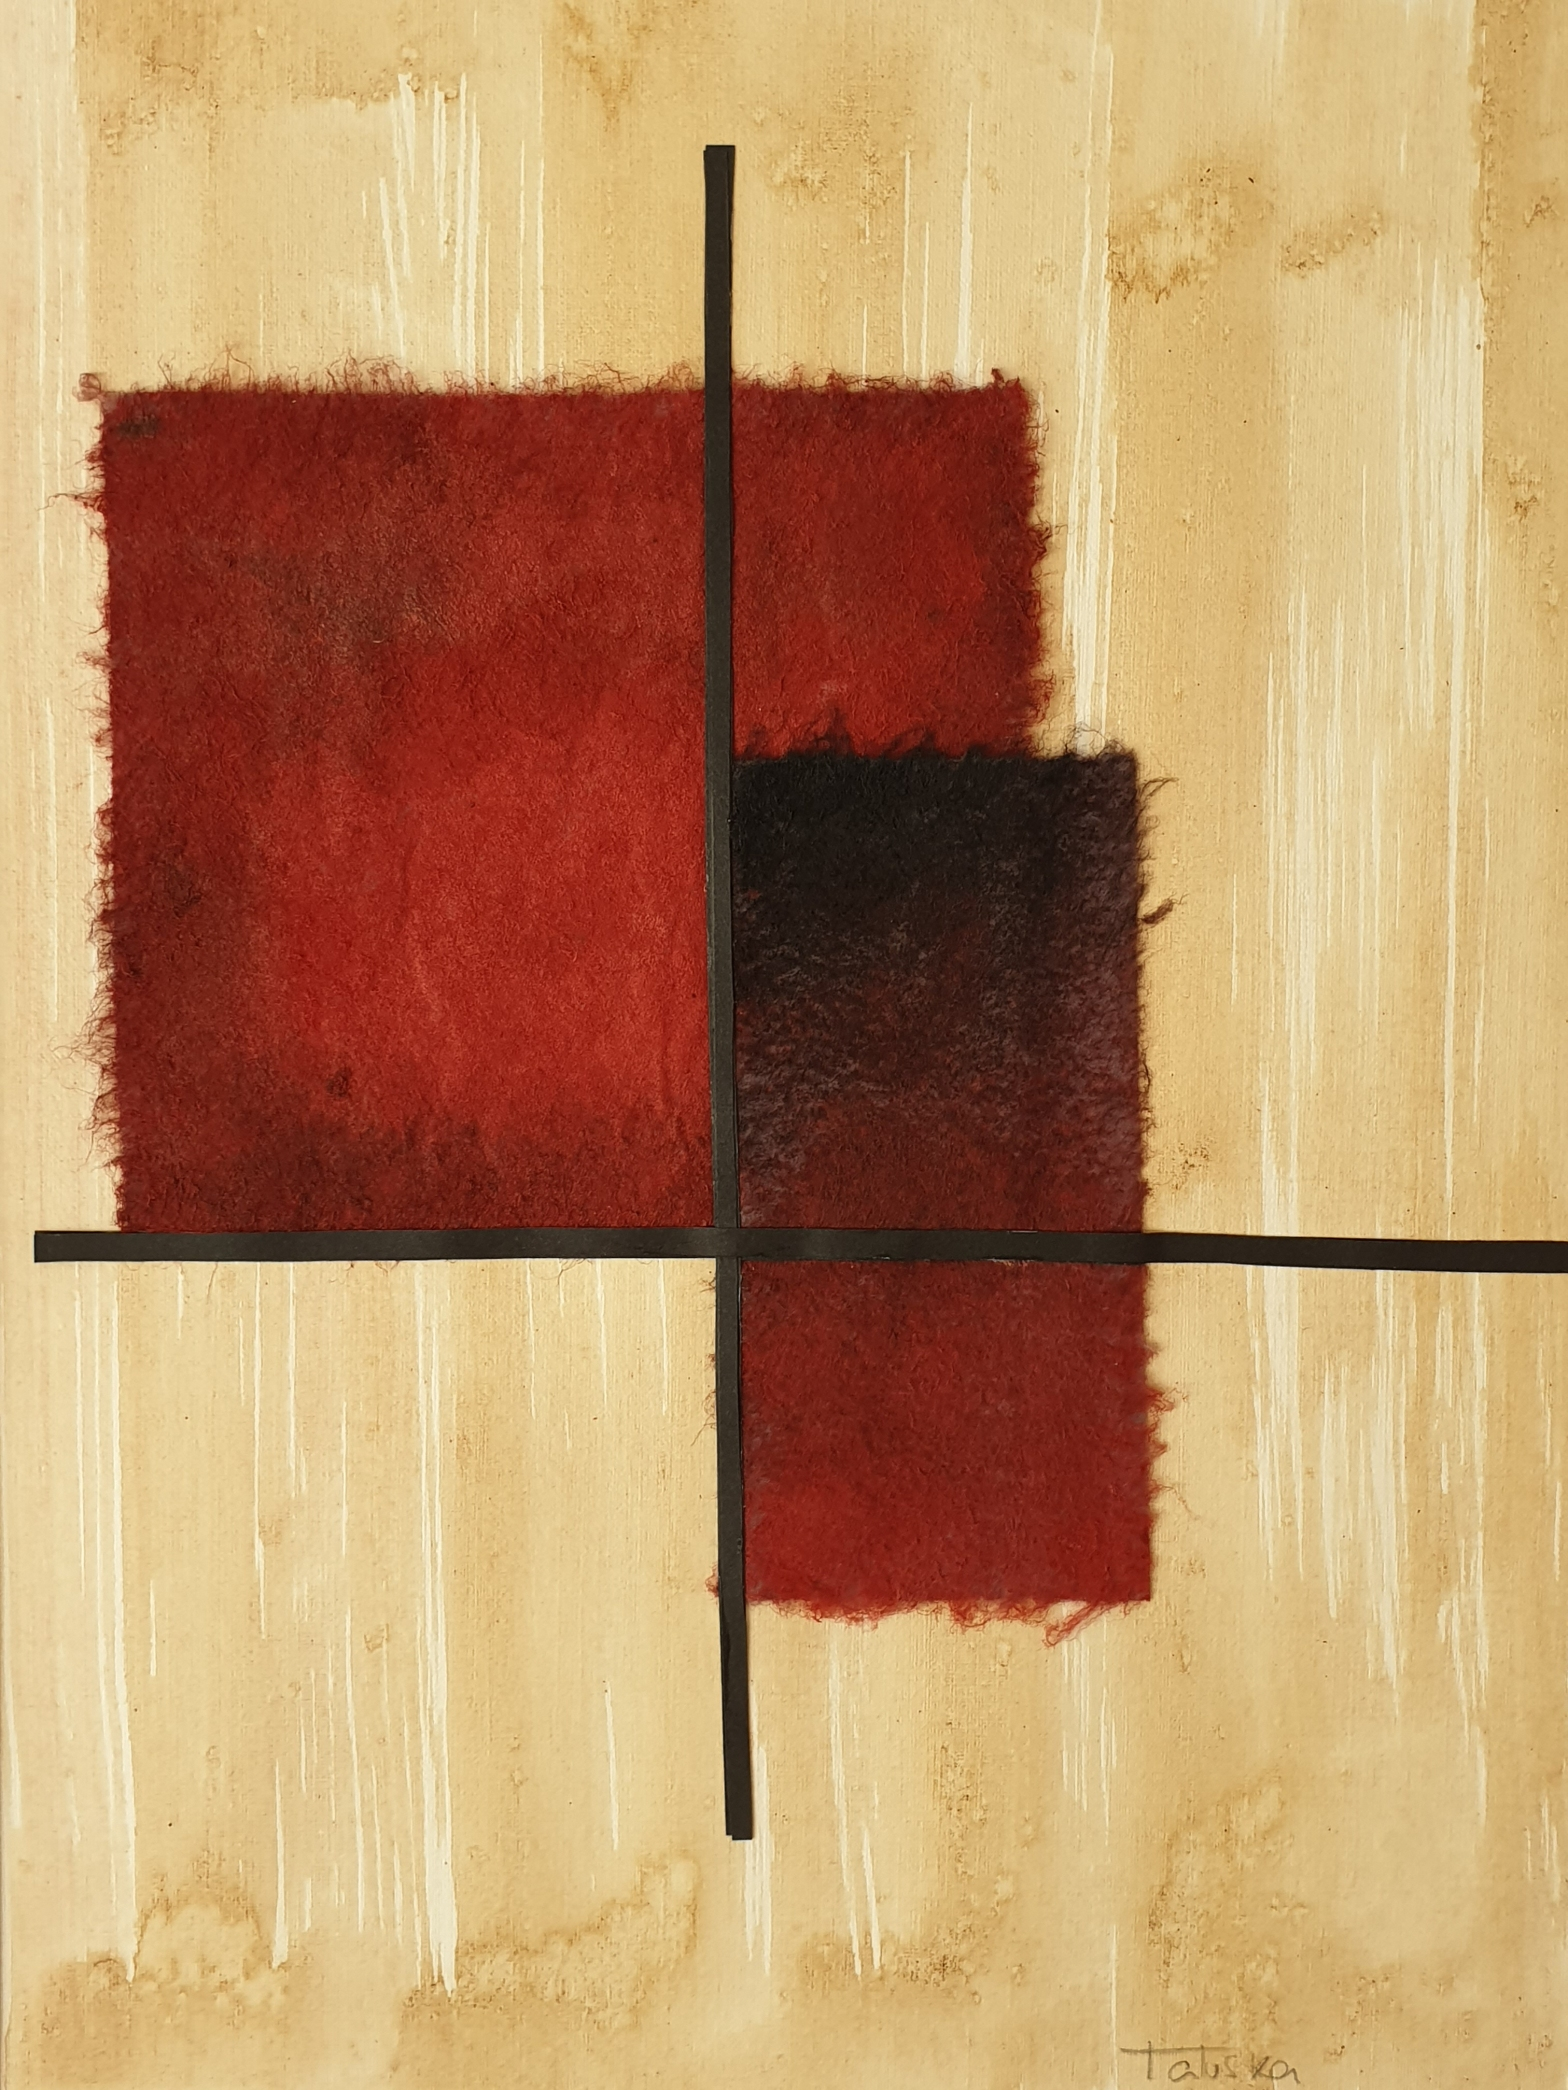 "Detalle del cuadro de arte abstracto titulado ""Burning couple"" de la artista Tatuska"